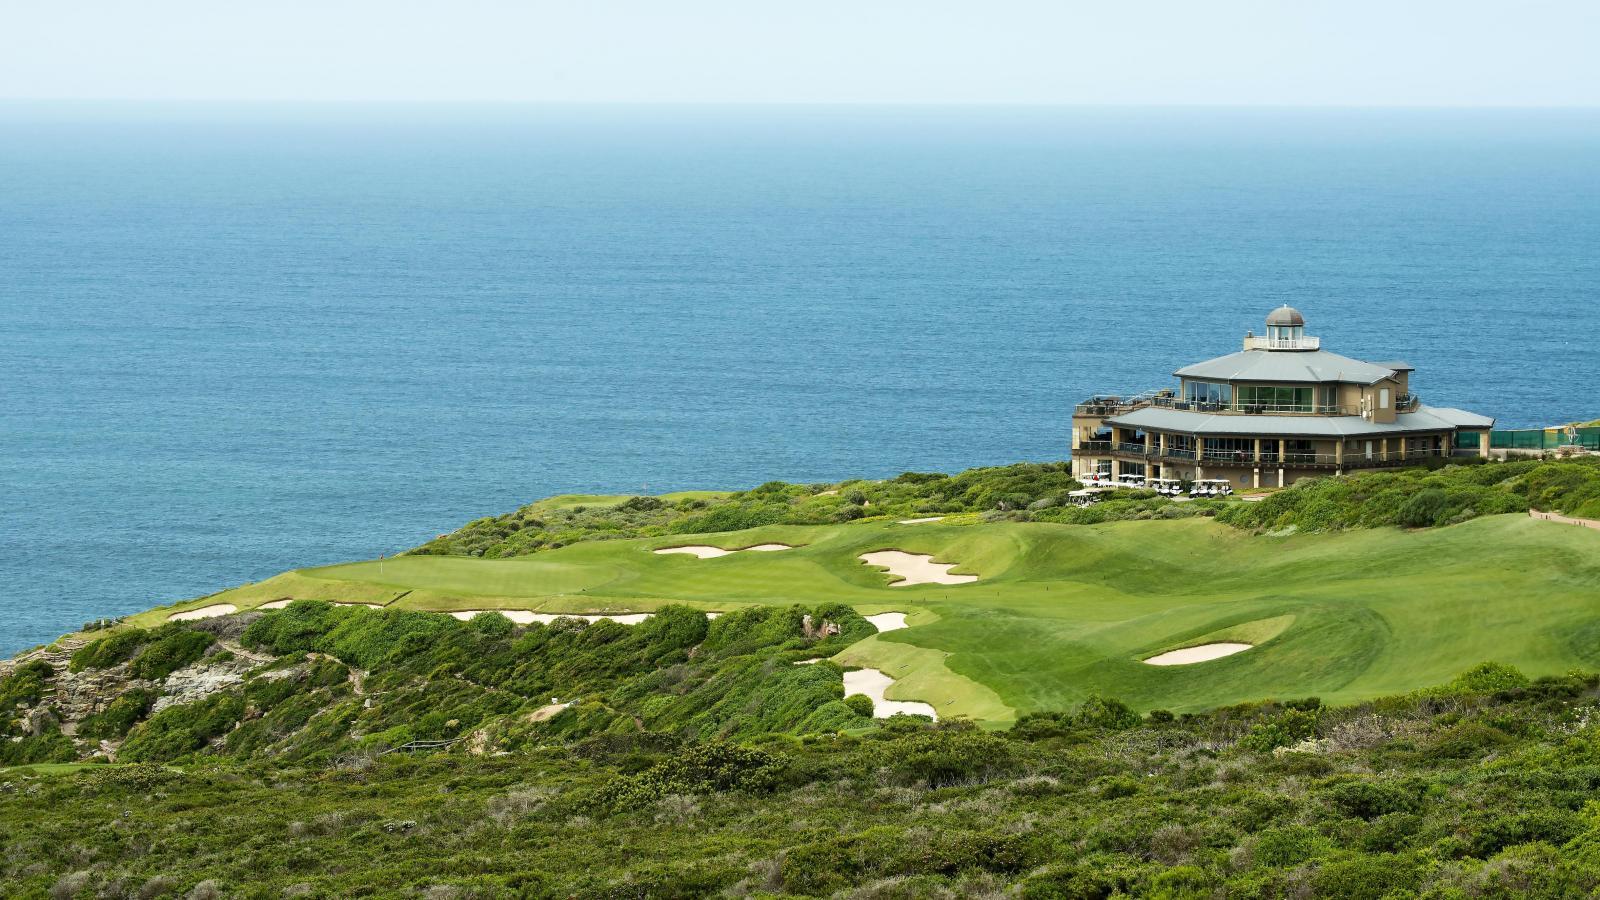 Pinnacle point golf club book golf online golfscape - Golf cart rentals garden city sc ...